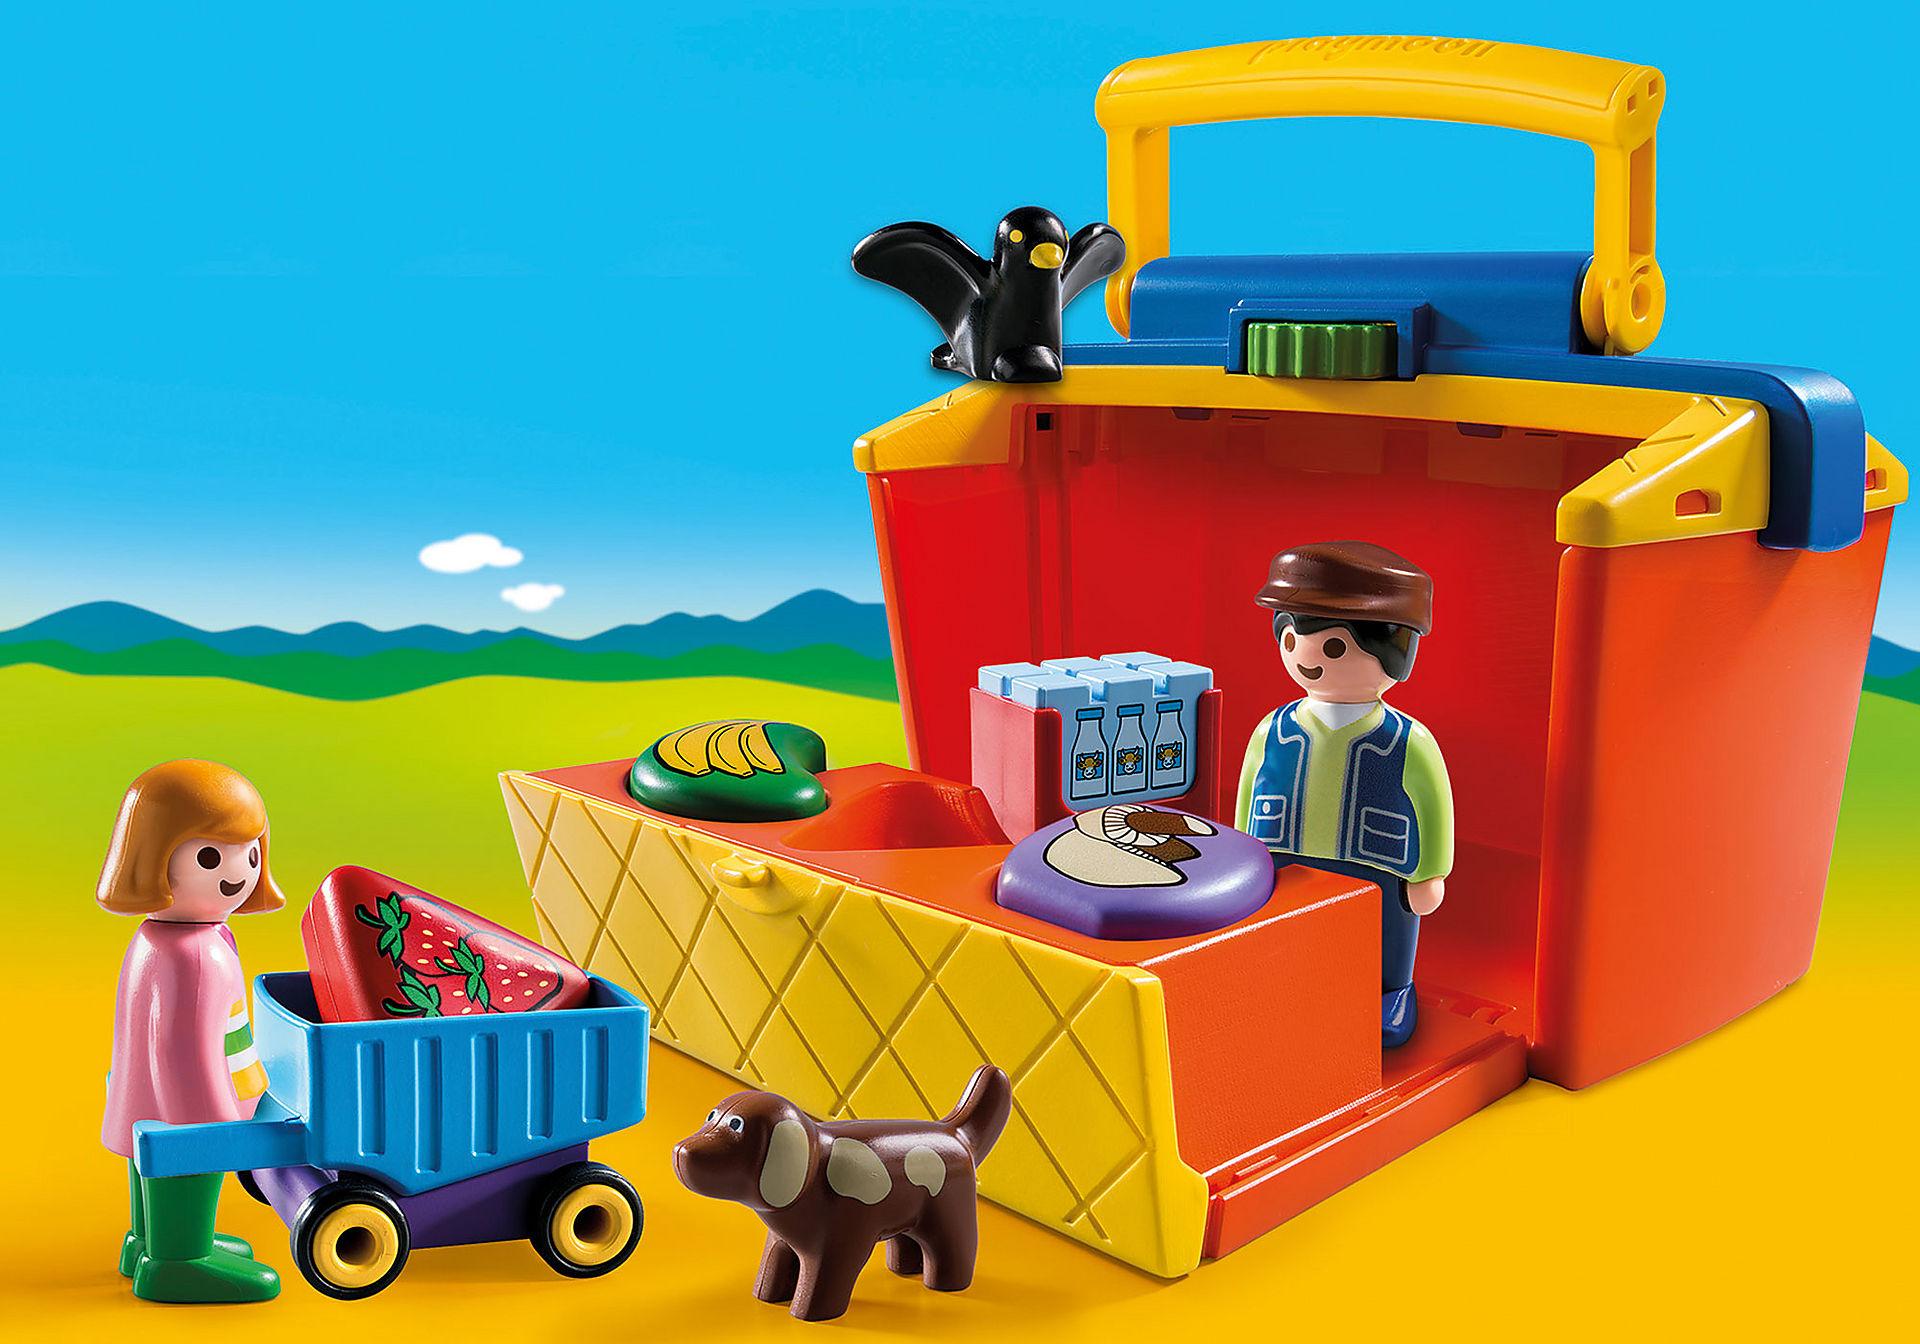 http://media.playmobil.com/i/playmobil/9123_product_detail/Mein Marktstand zum Mitnehmen